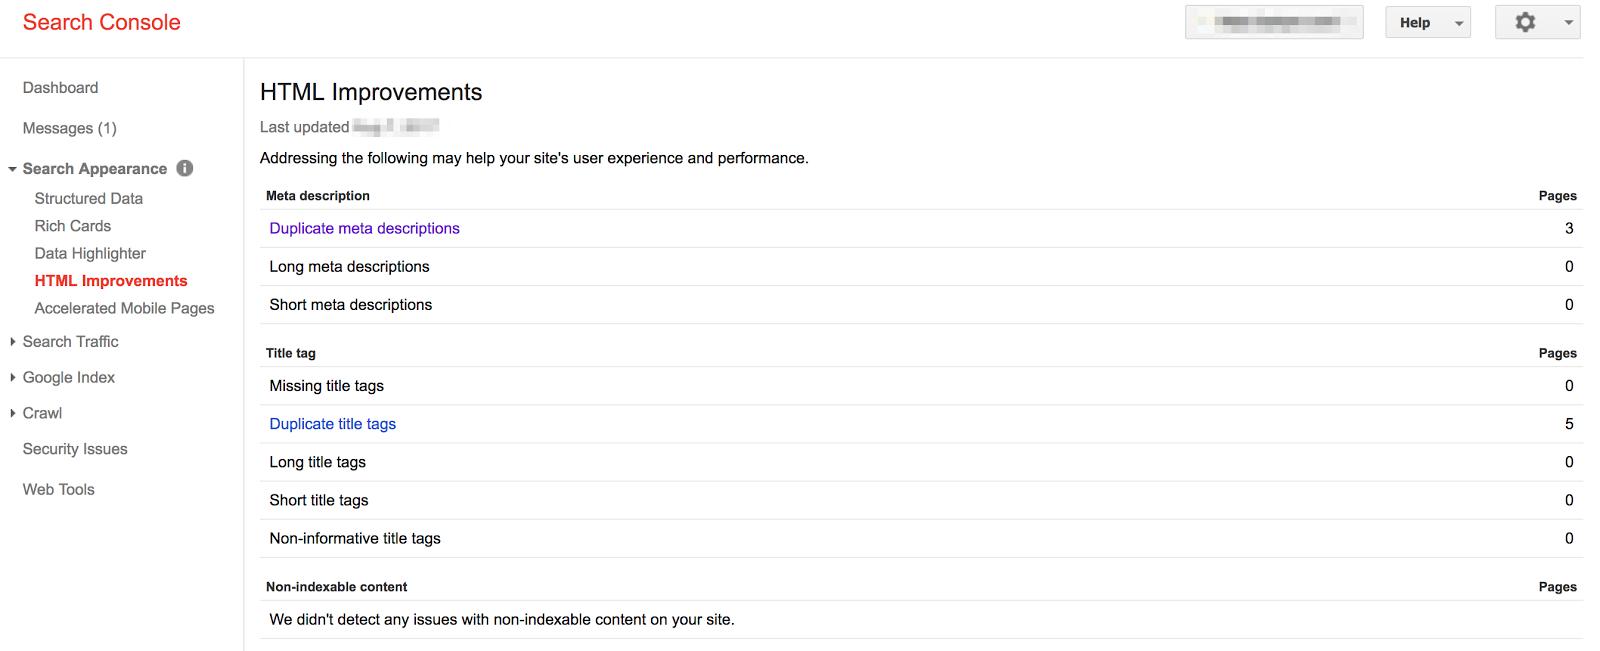 google search console html improvements